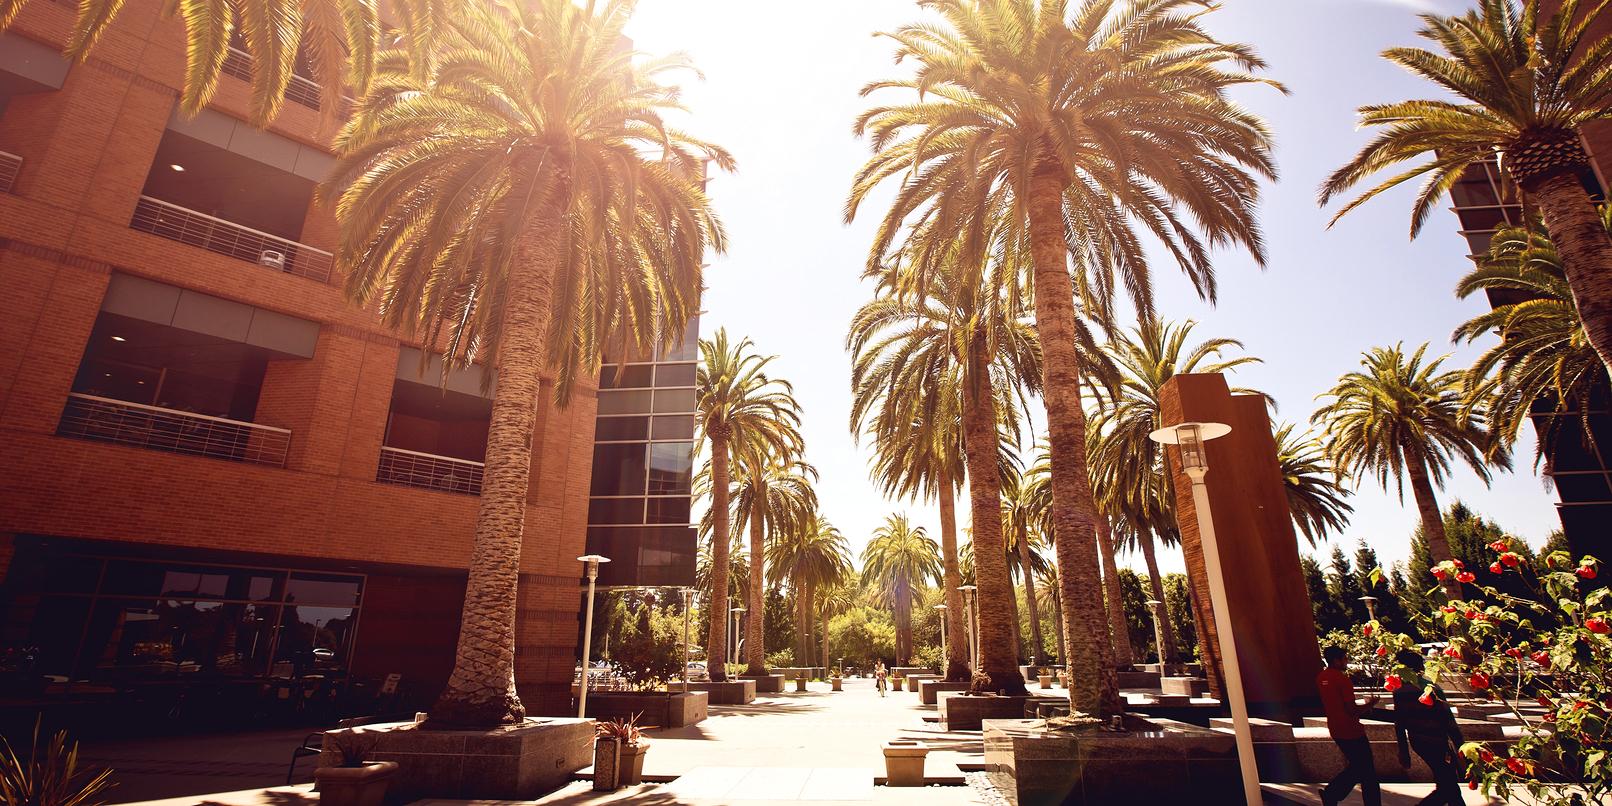 Palo Alto mayor: Tech firms are 'choking' the city